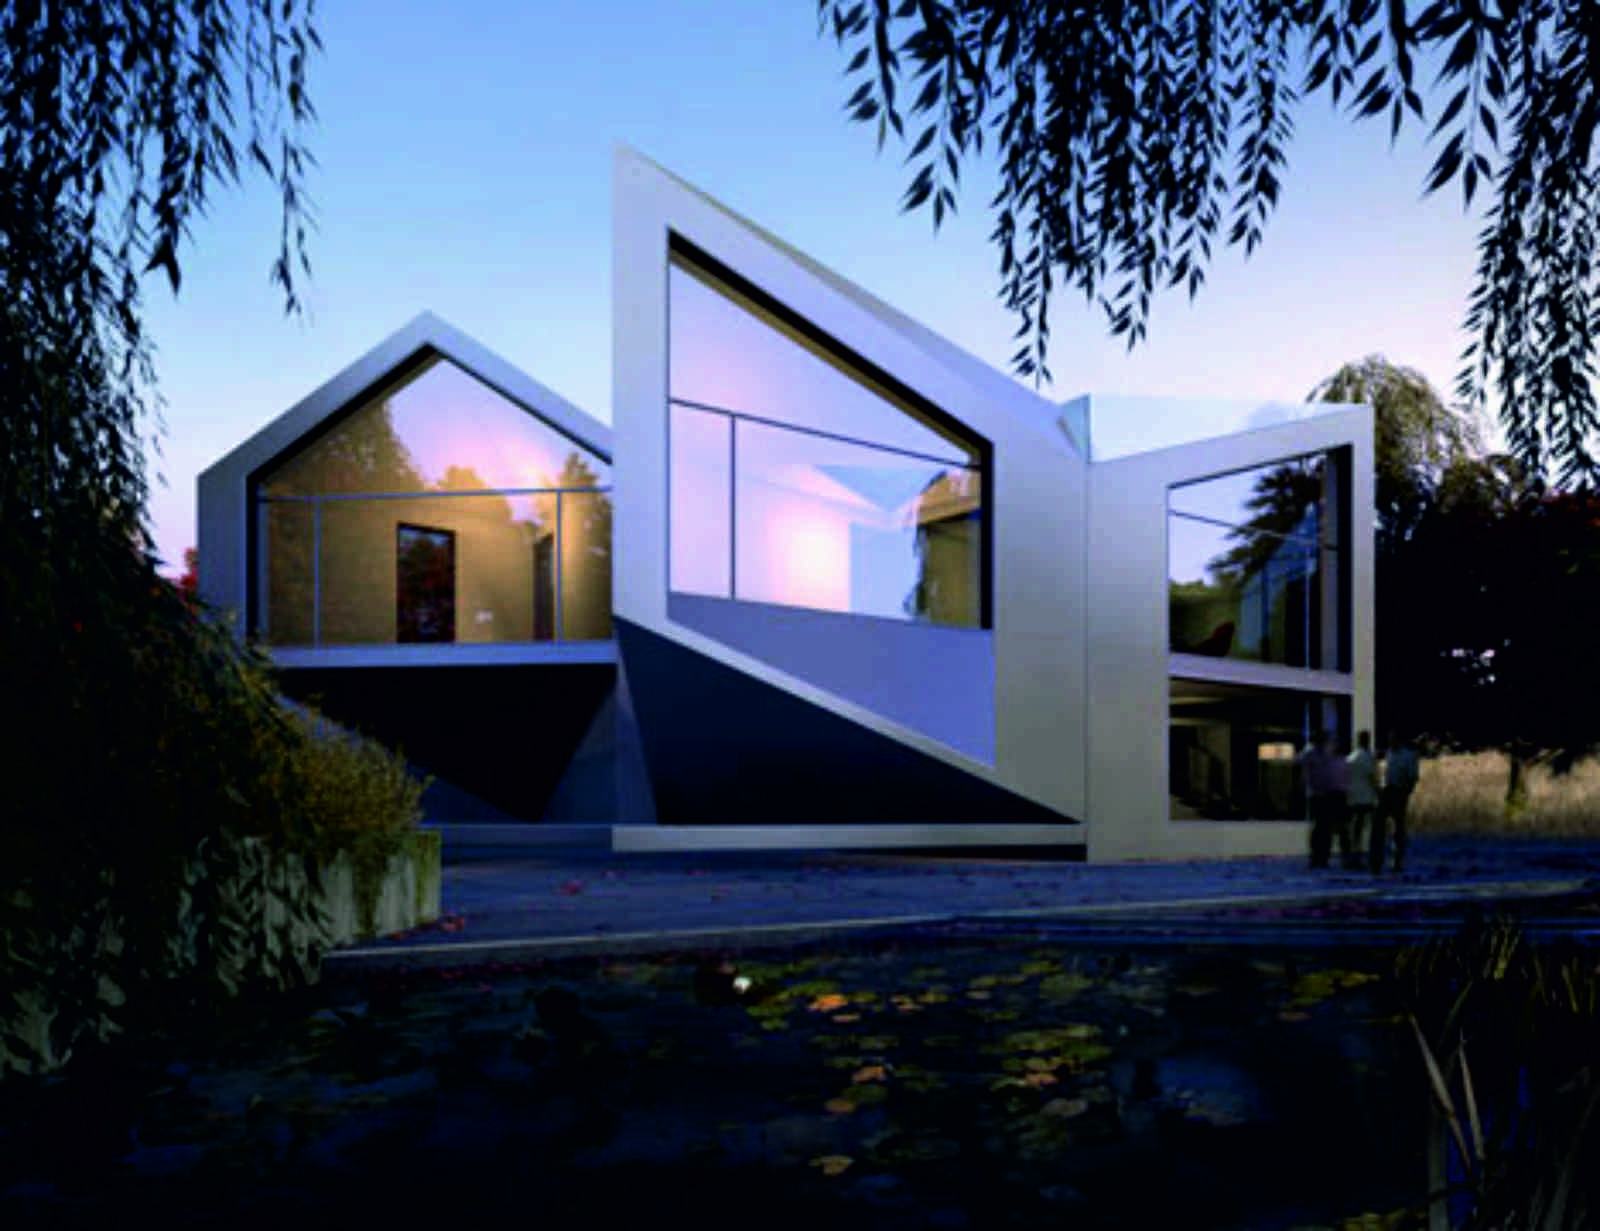 THE D*HAUS CONCEPT | A As Architecture